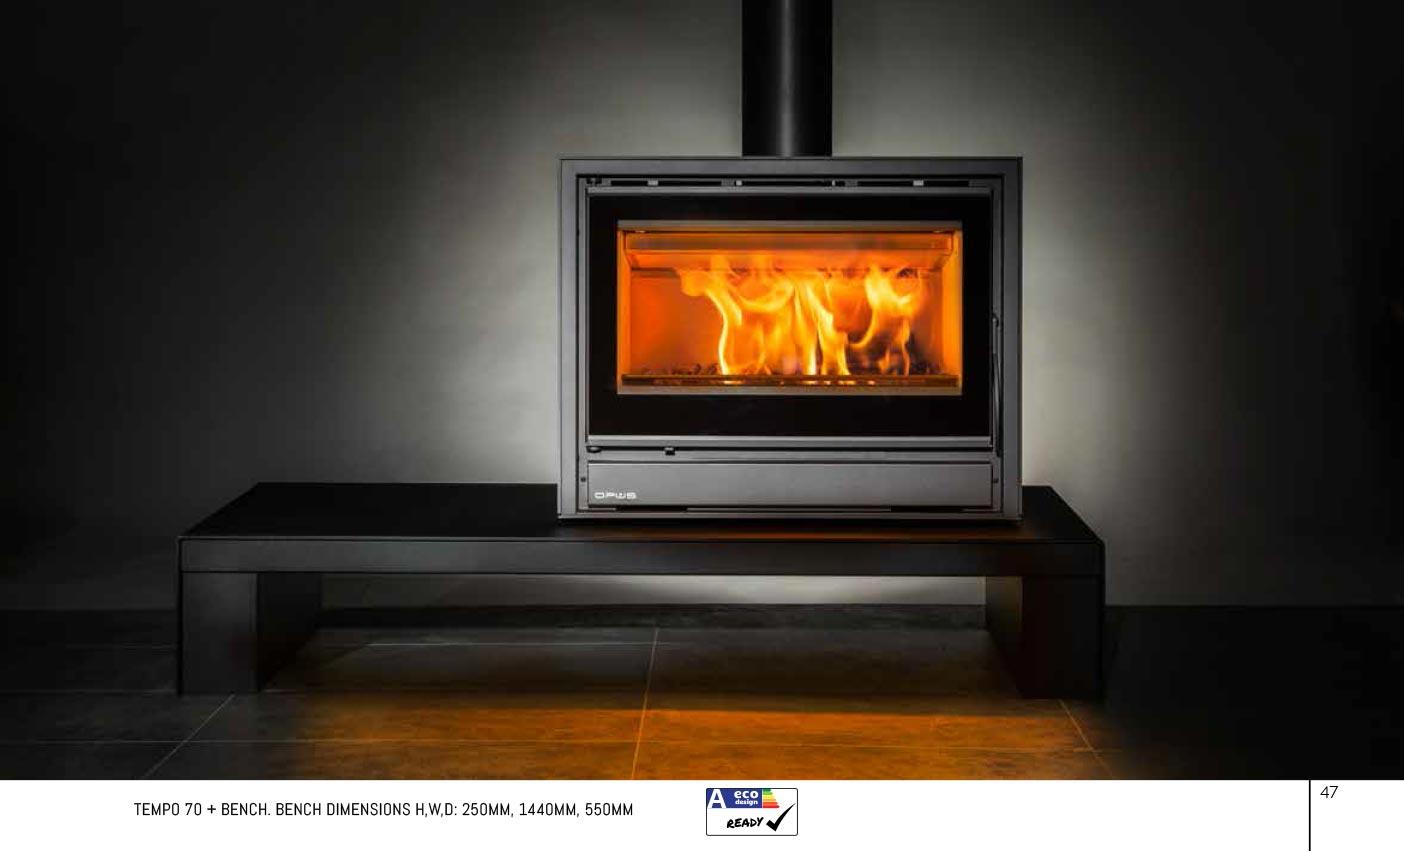 opus-stoves-brochure-(2)-47